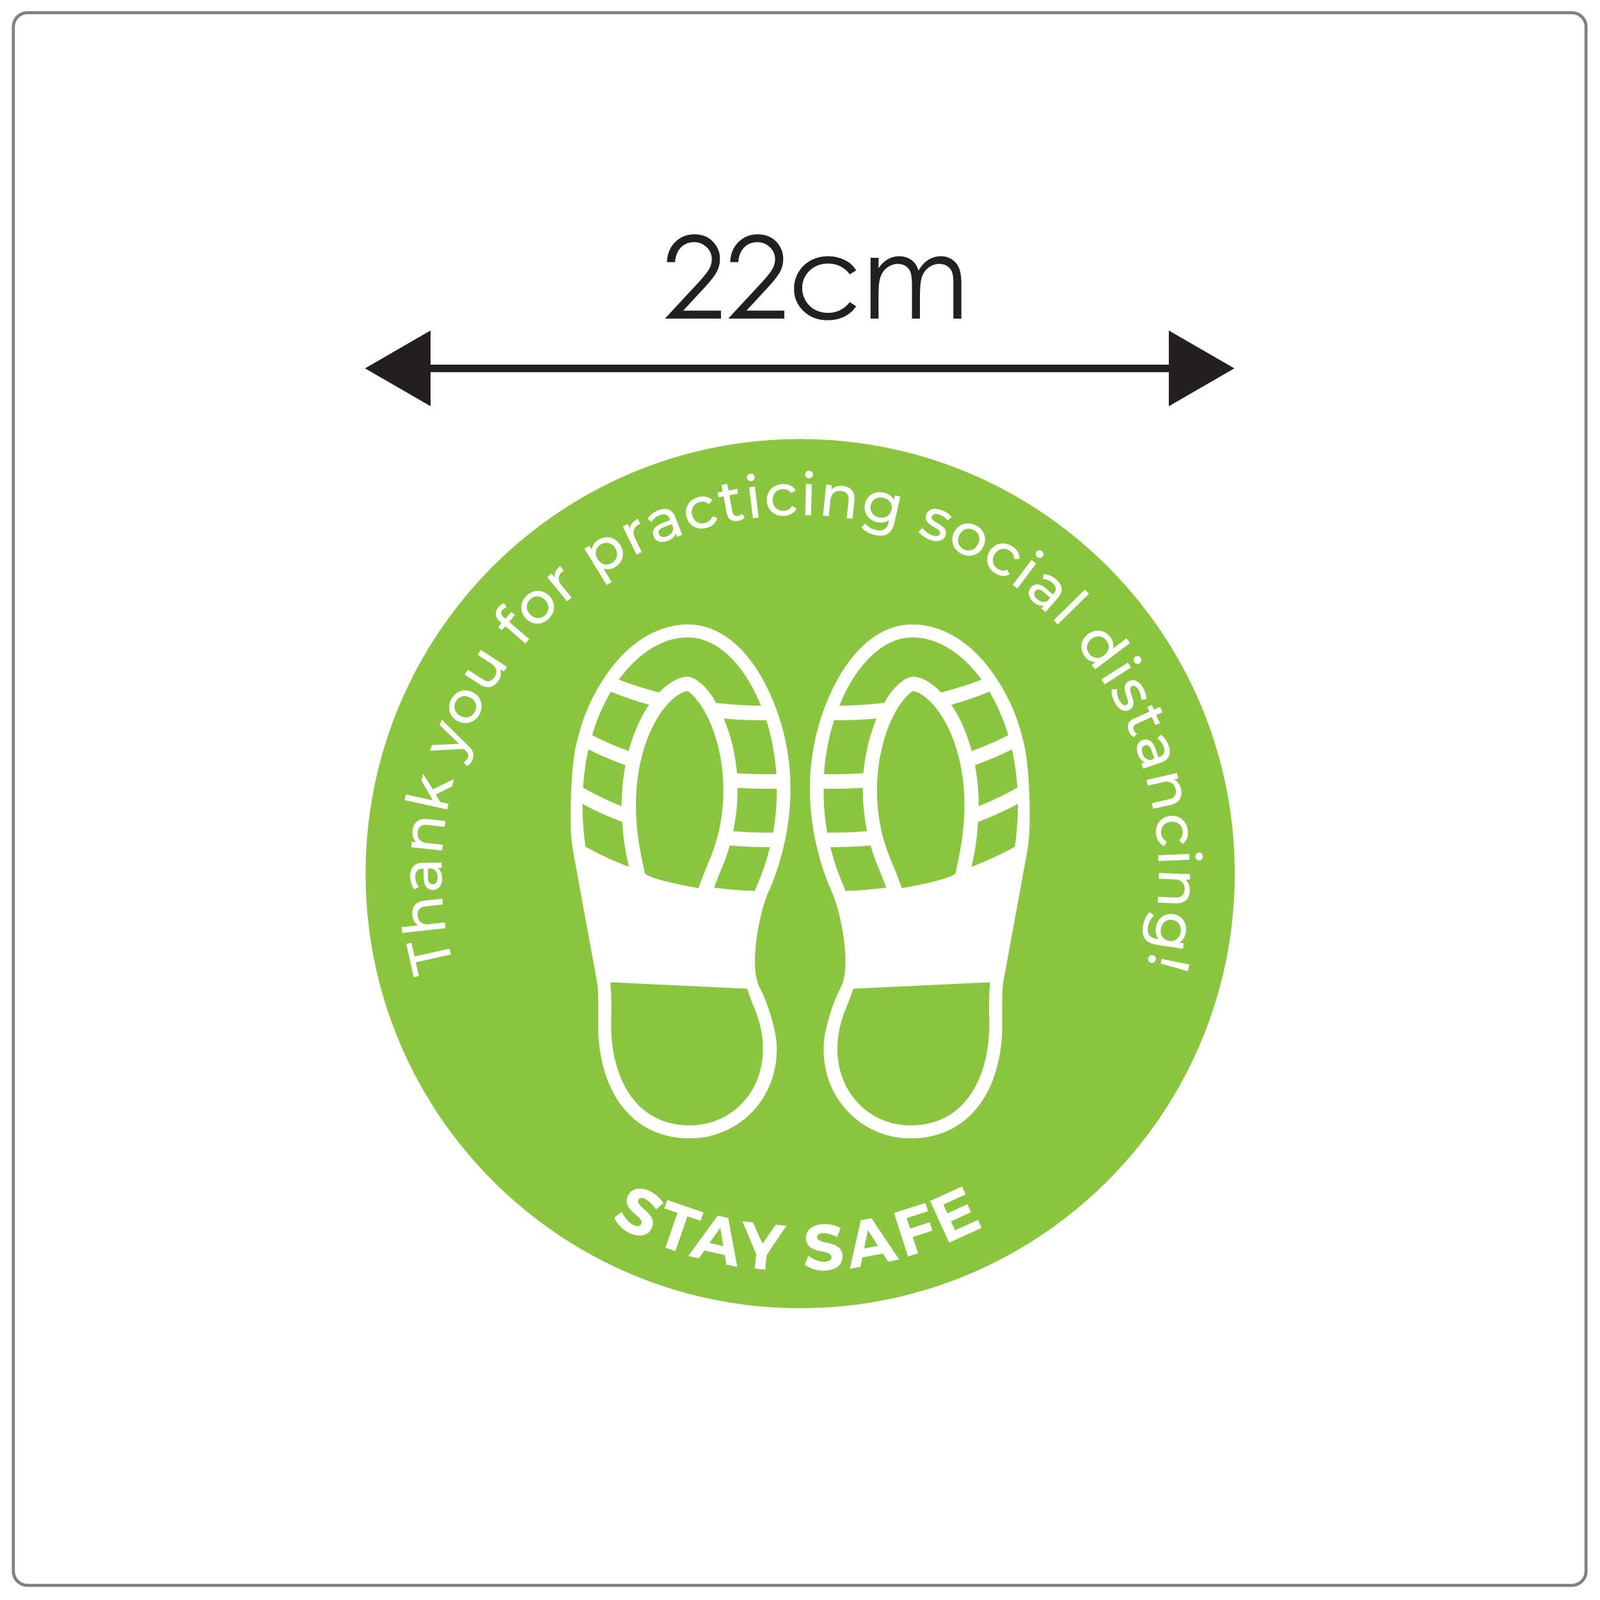 social distancing floor sticker for carpet, sizing Self-adhesive Corona virus floor sticker to help social distancing.